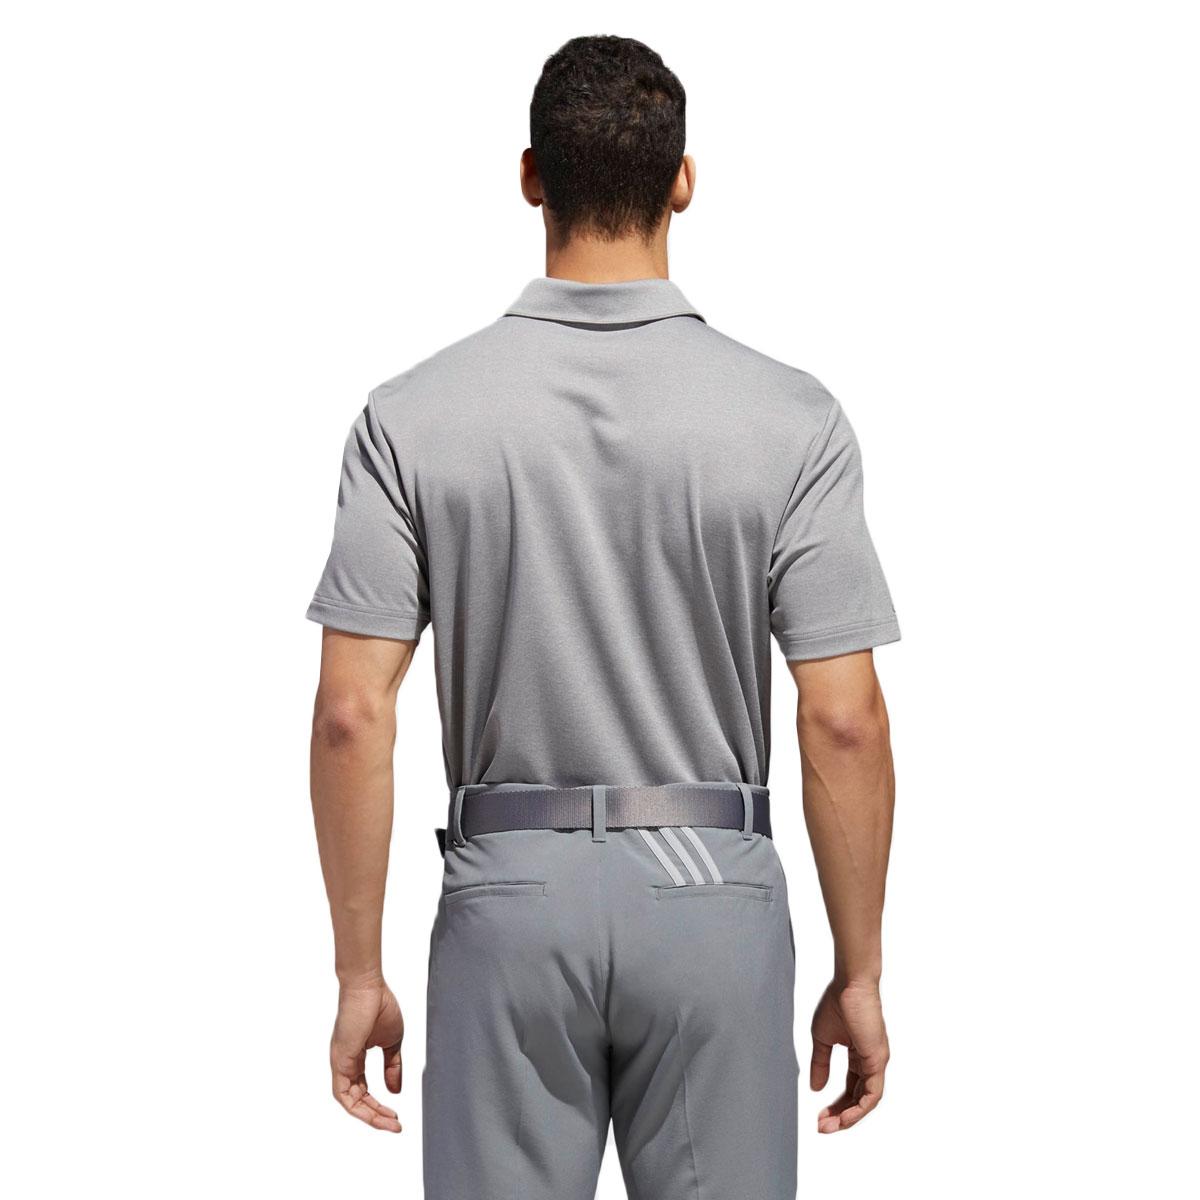 Adidas-Golf-Homme-3-Stripe-Heather-bloque-UPF-50-Polo-Shirt-43-off-RRP miniature 8